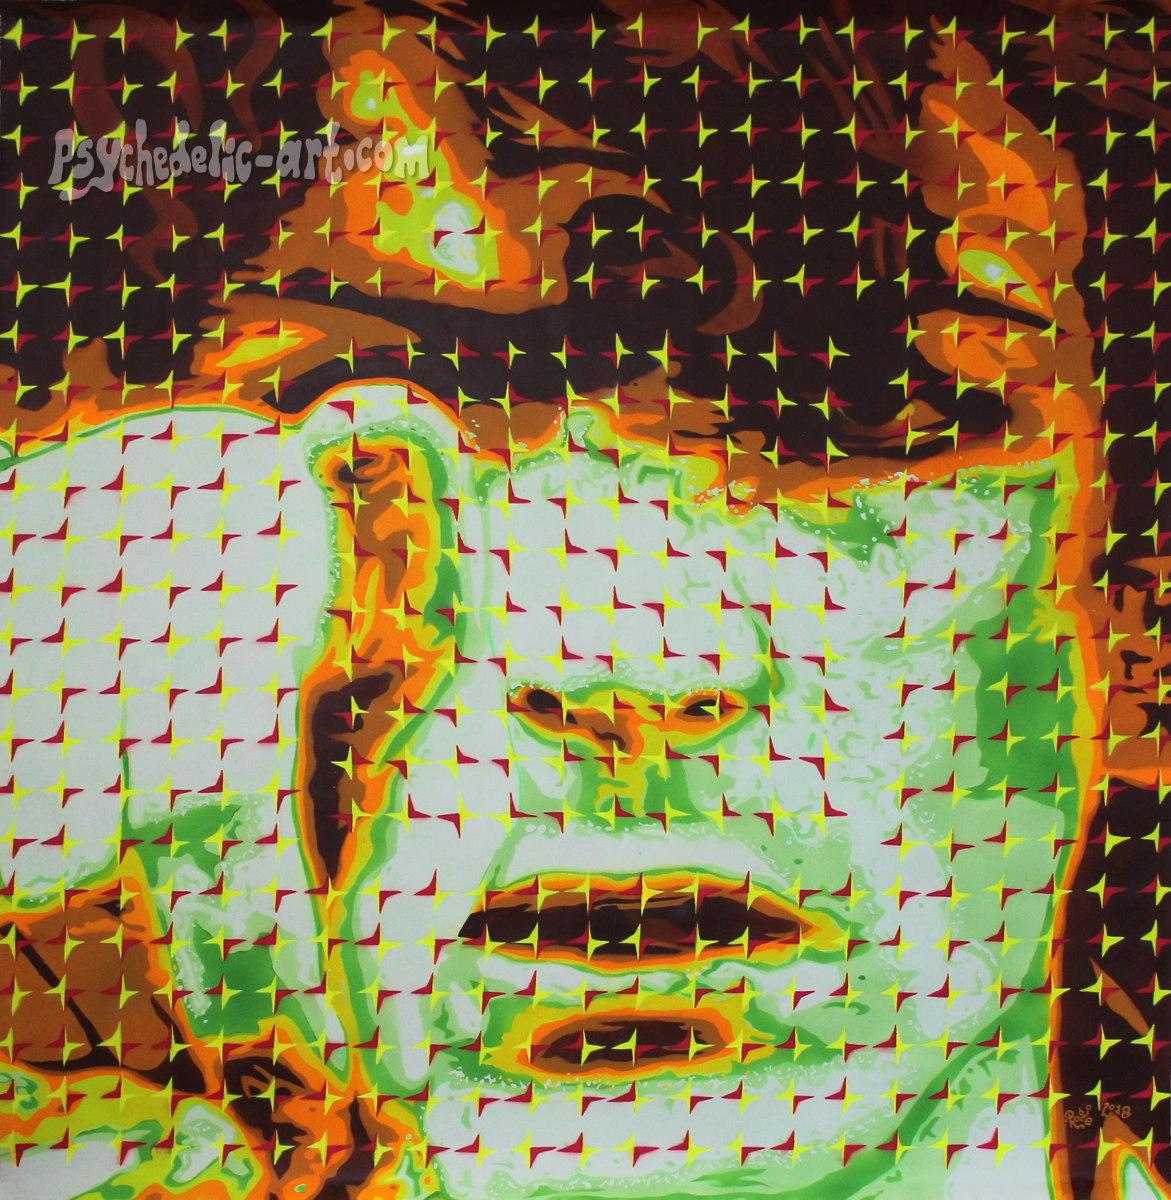 UV portrait of Syd Barrett pointing finger at viewer